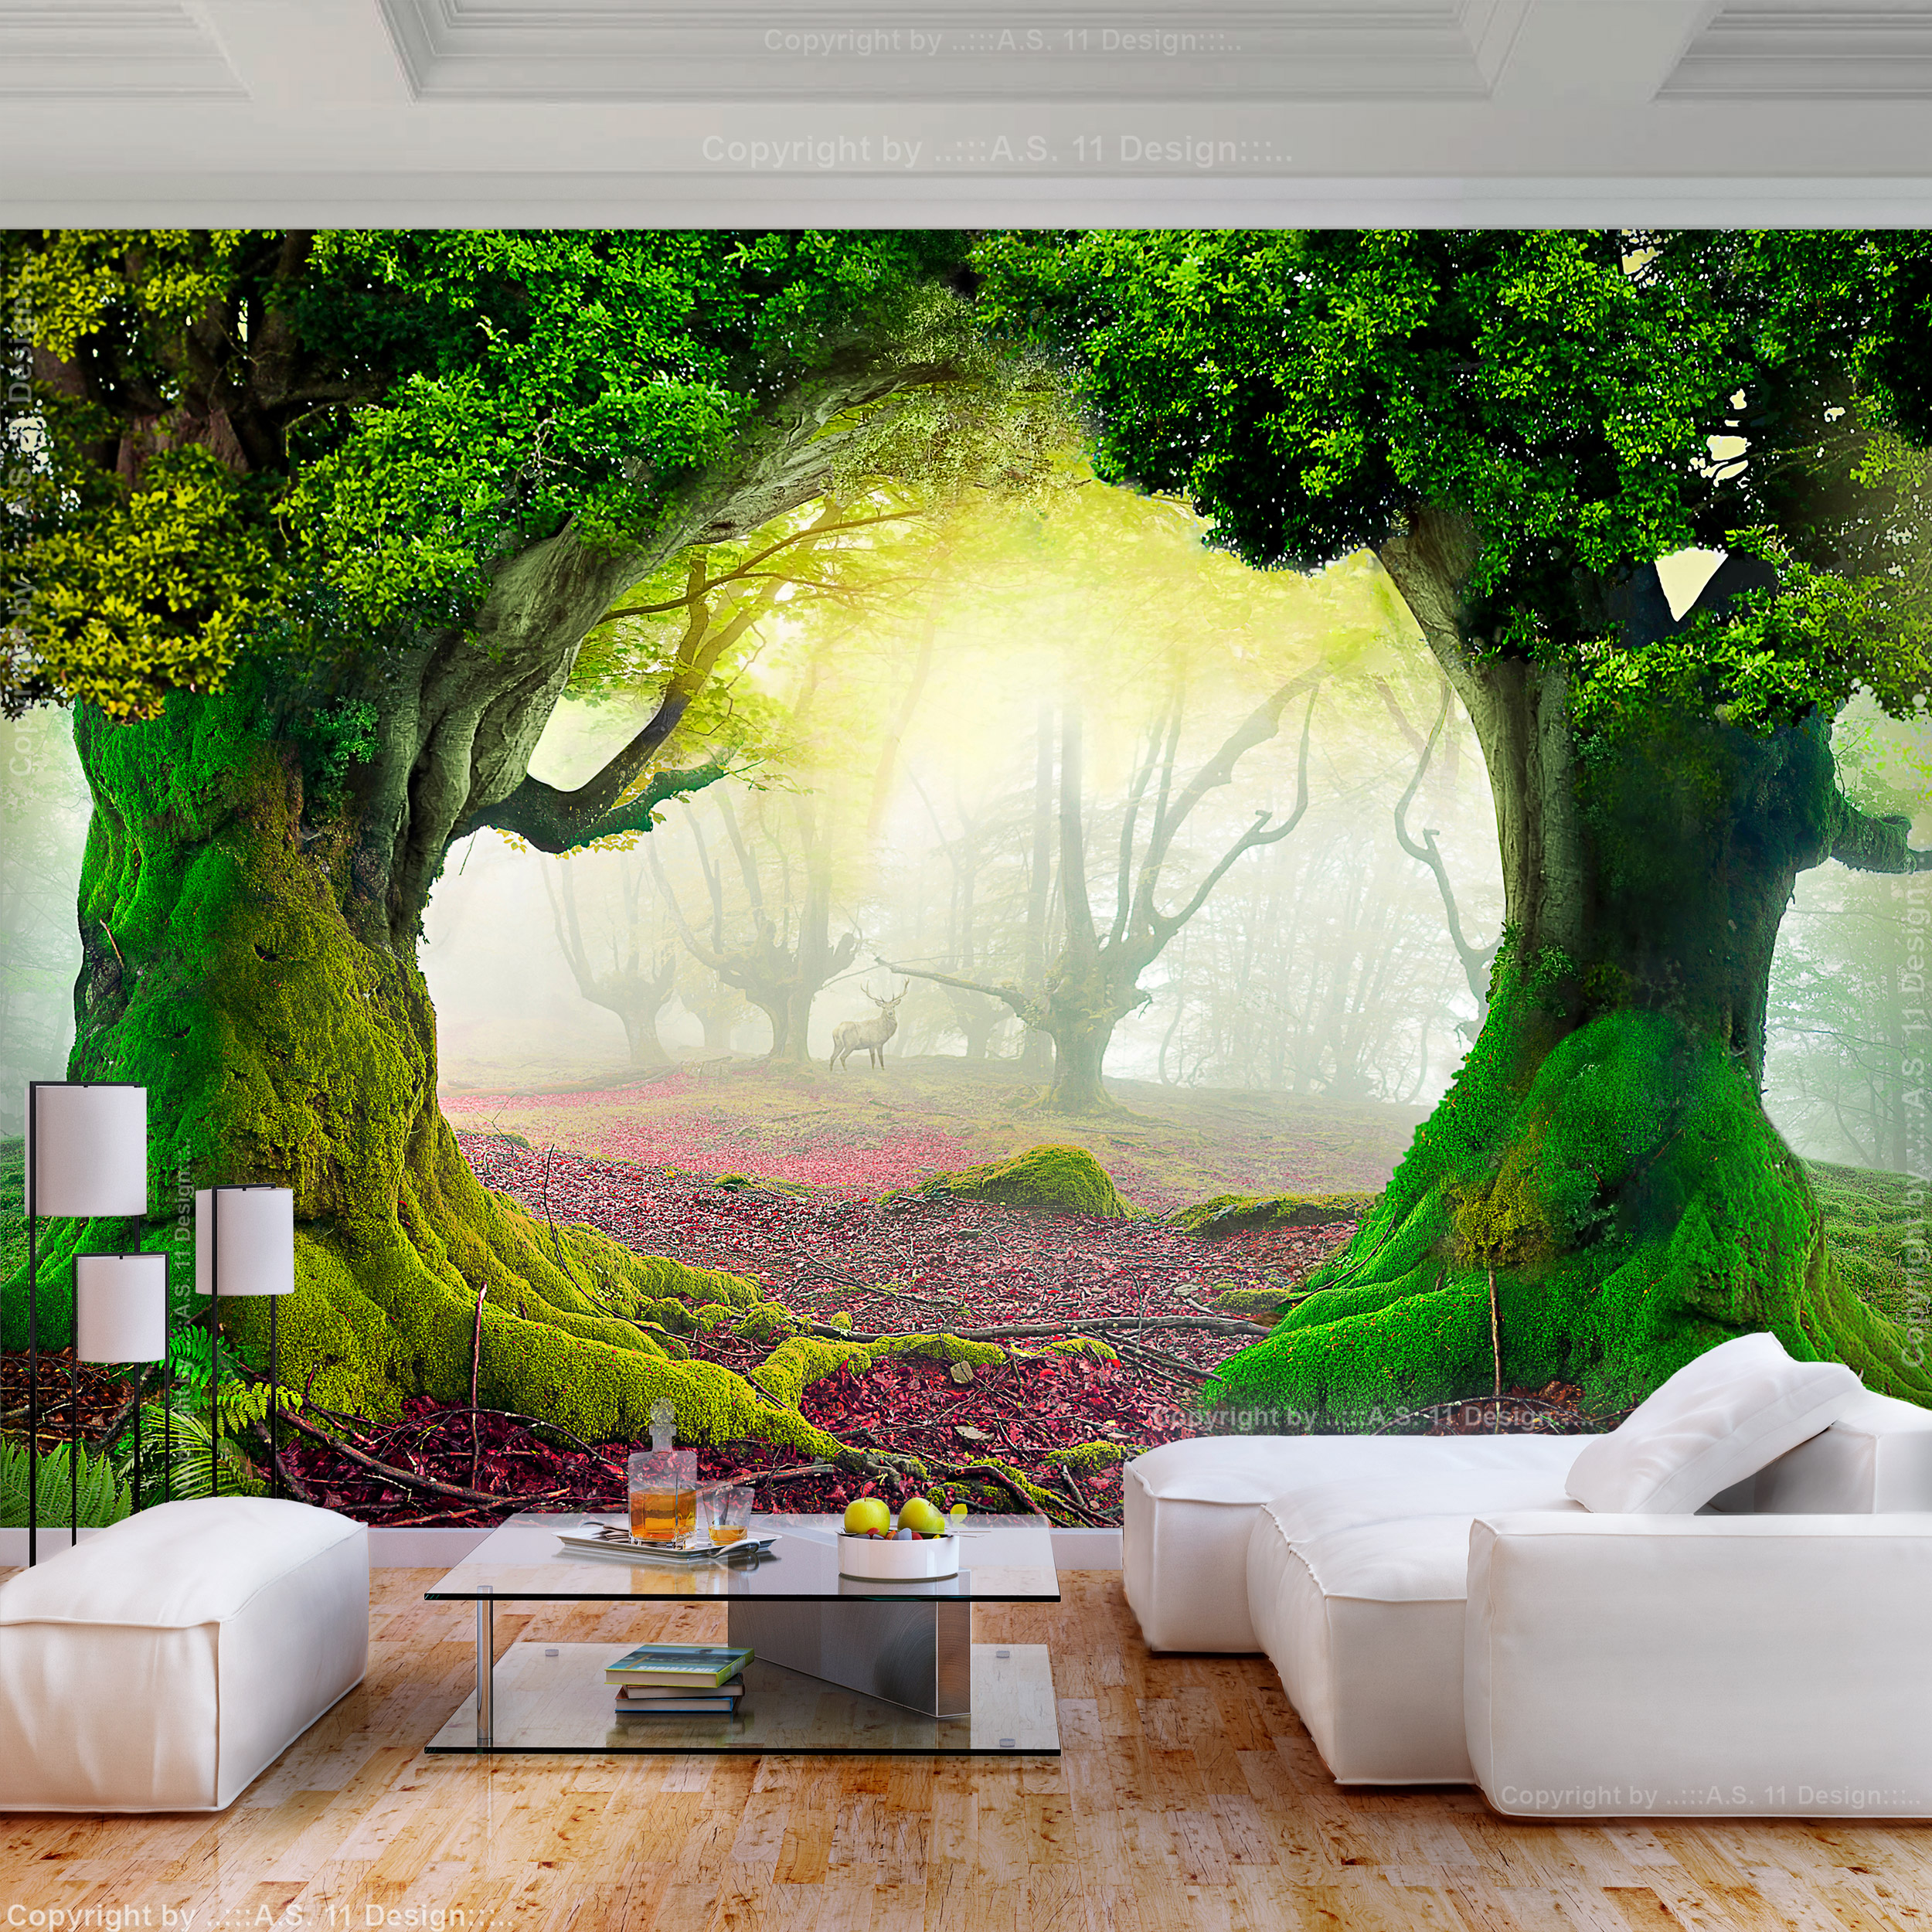 VLIES FOTOTAPETE Wald Natur Herbst 3D effekt TAPETE